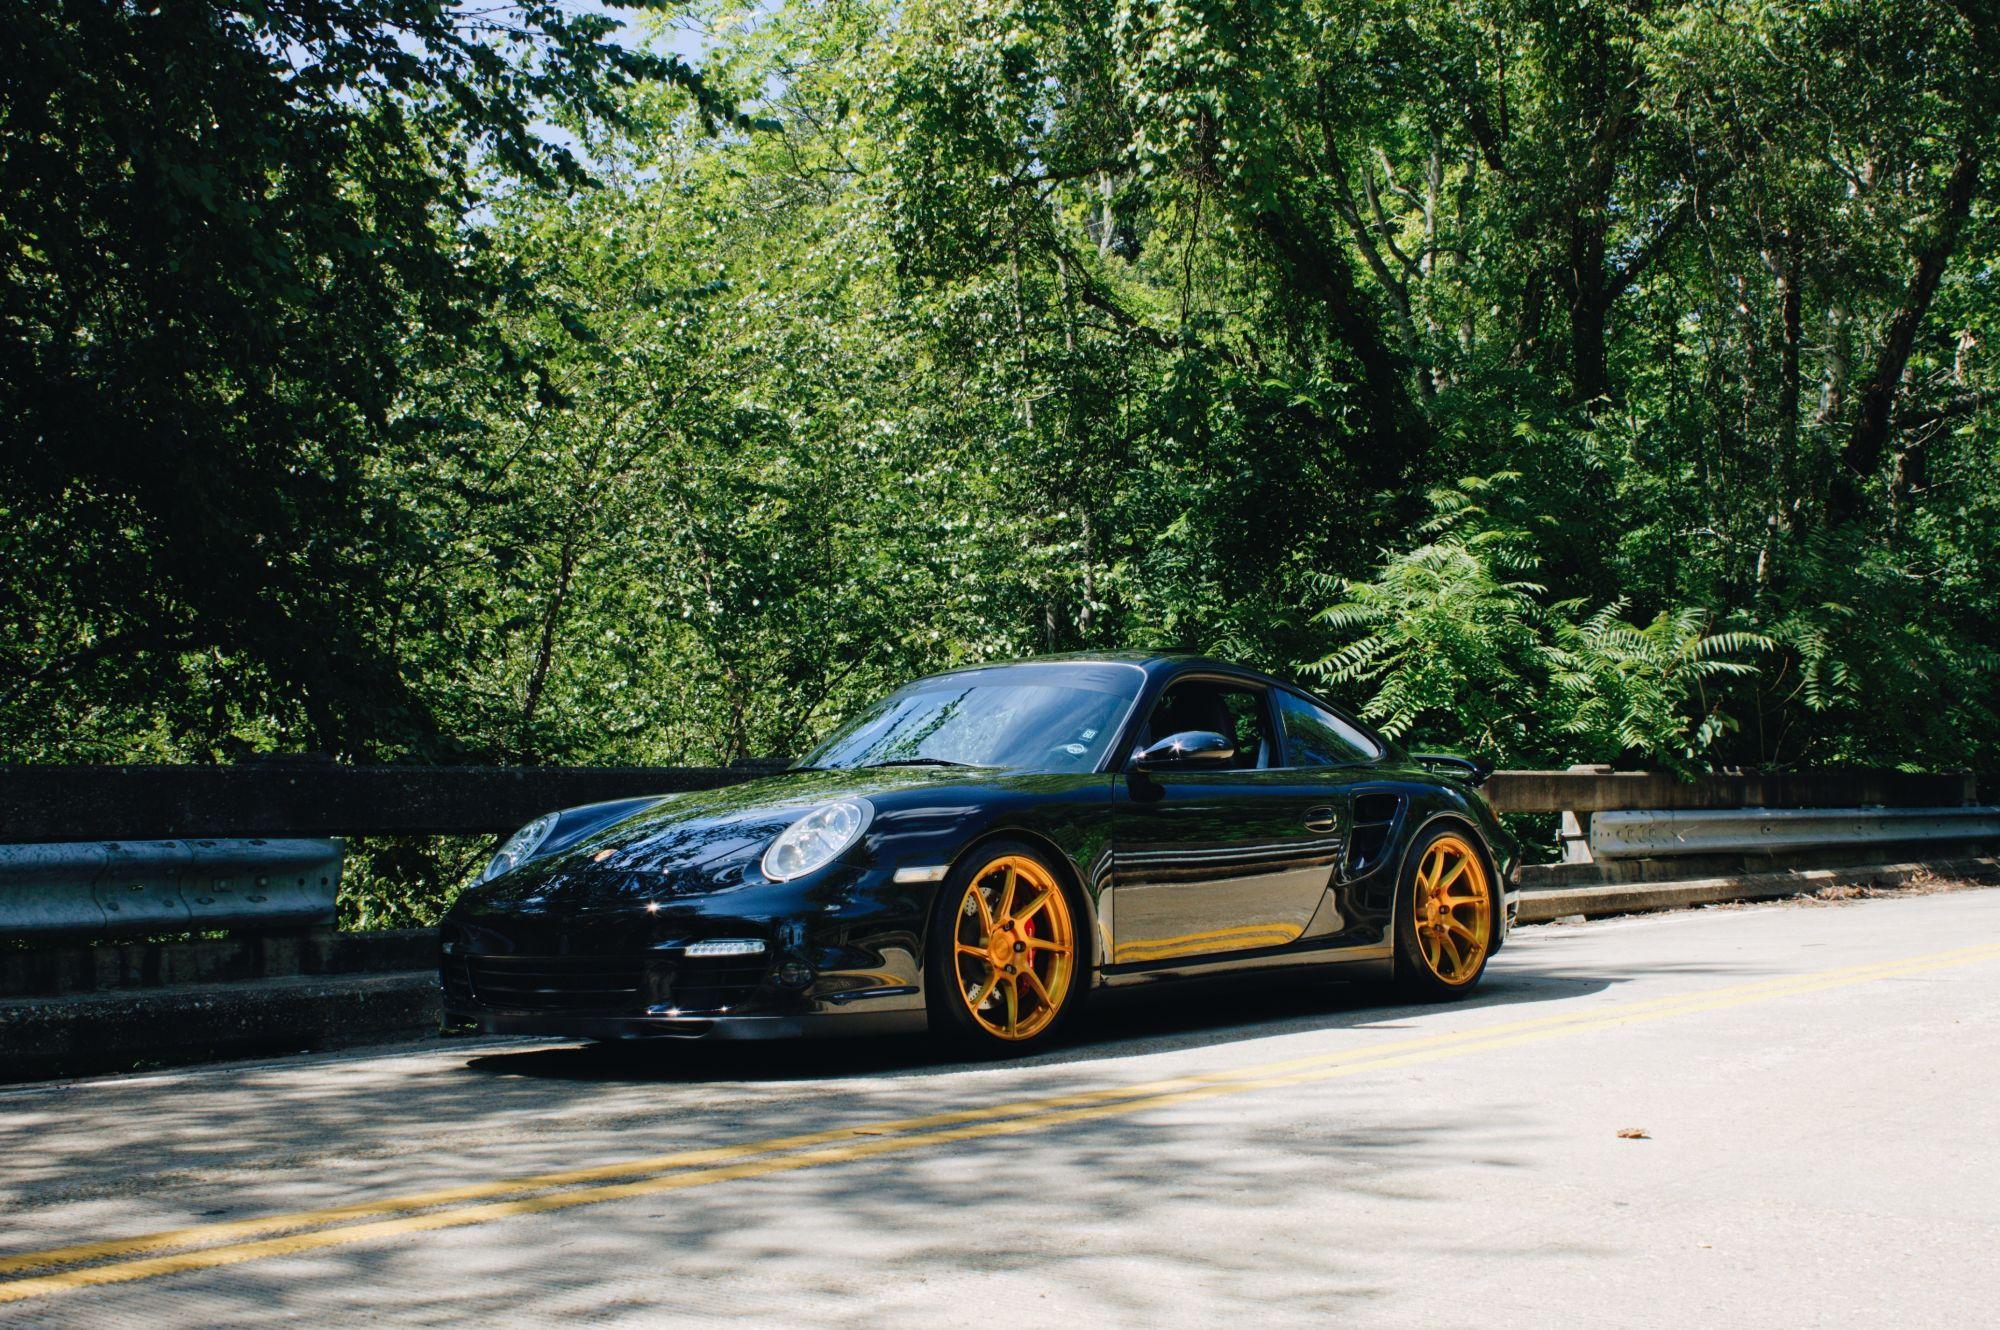 Wheel decisions for basalt black - Rennlist - Porsche Discussion Forums